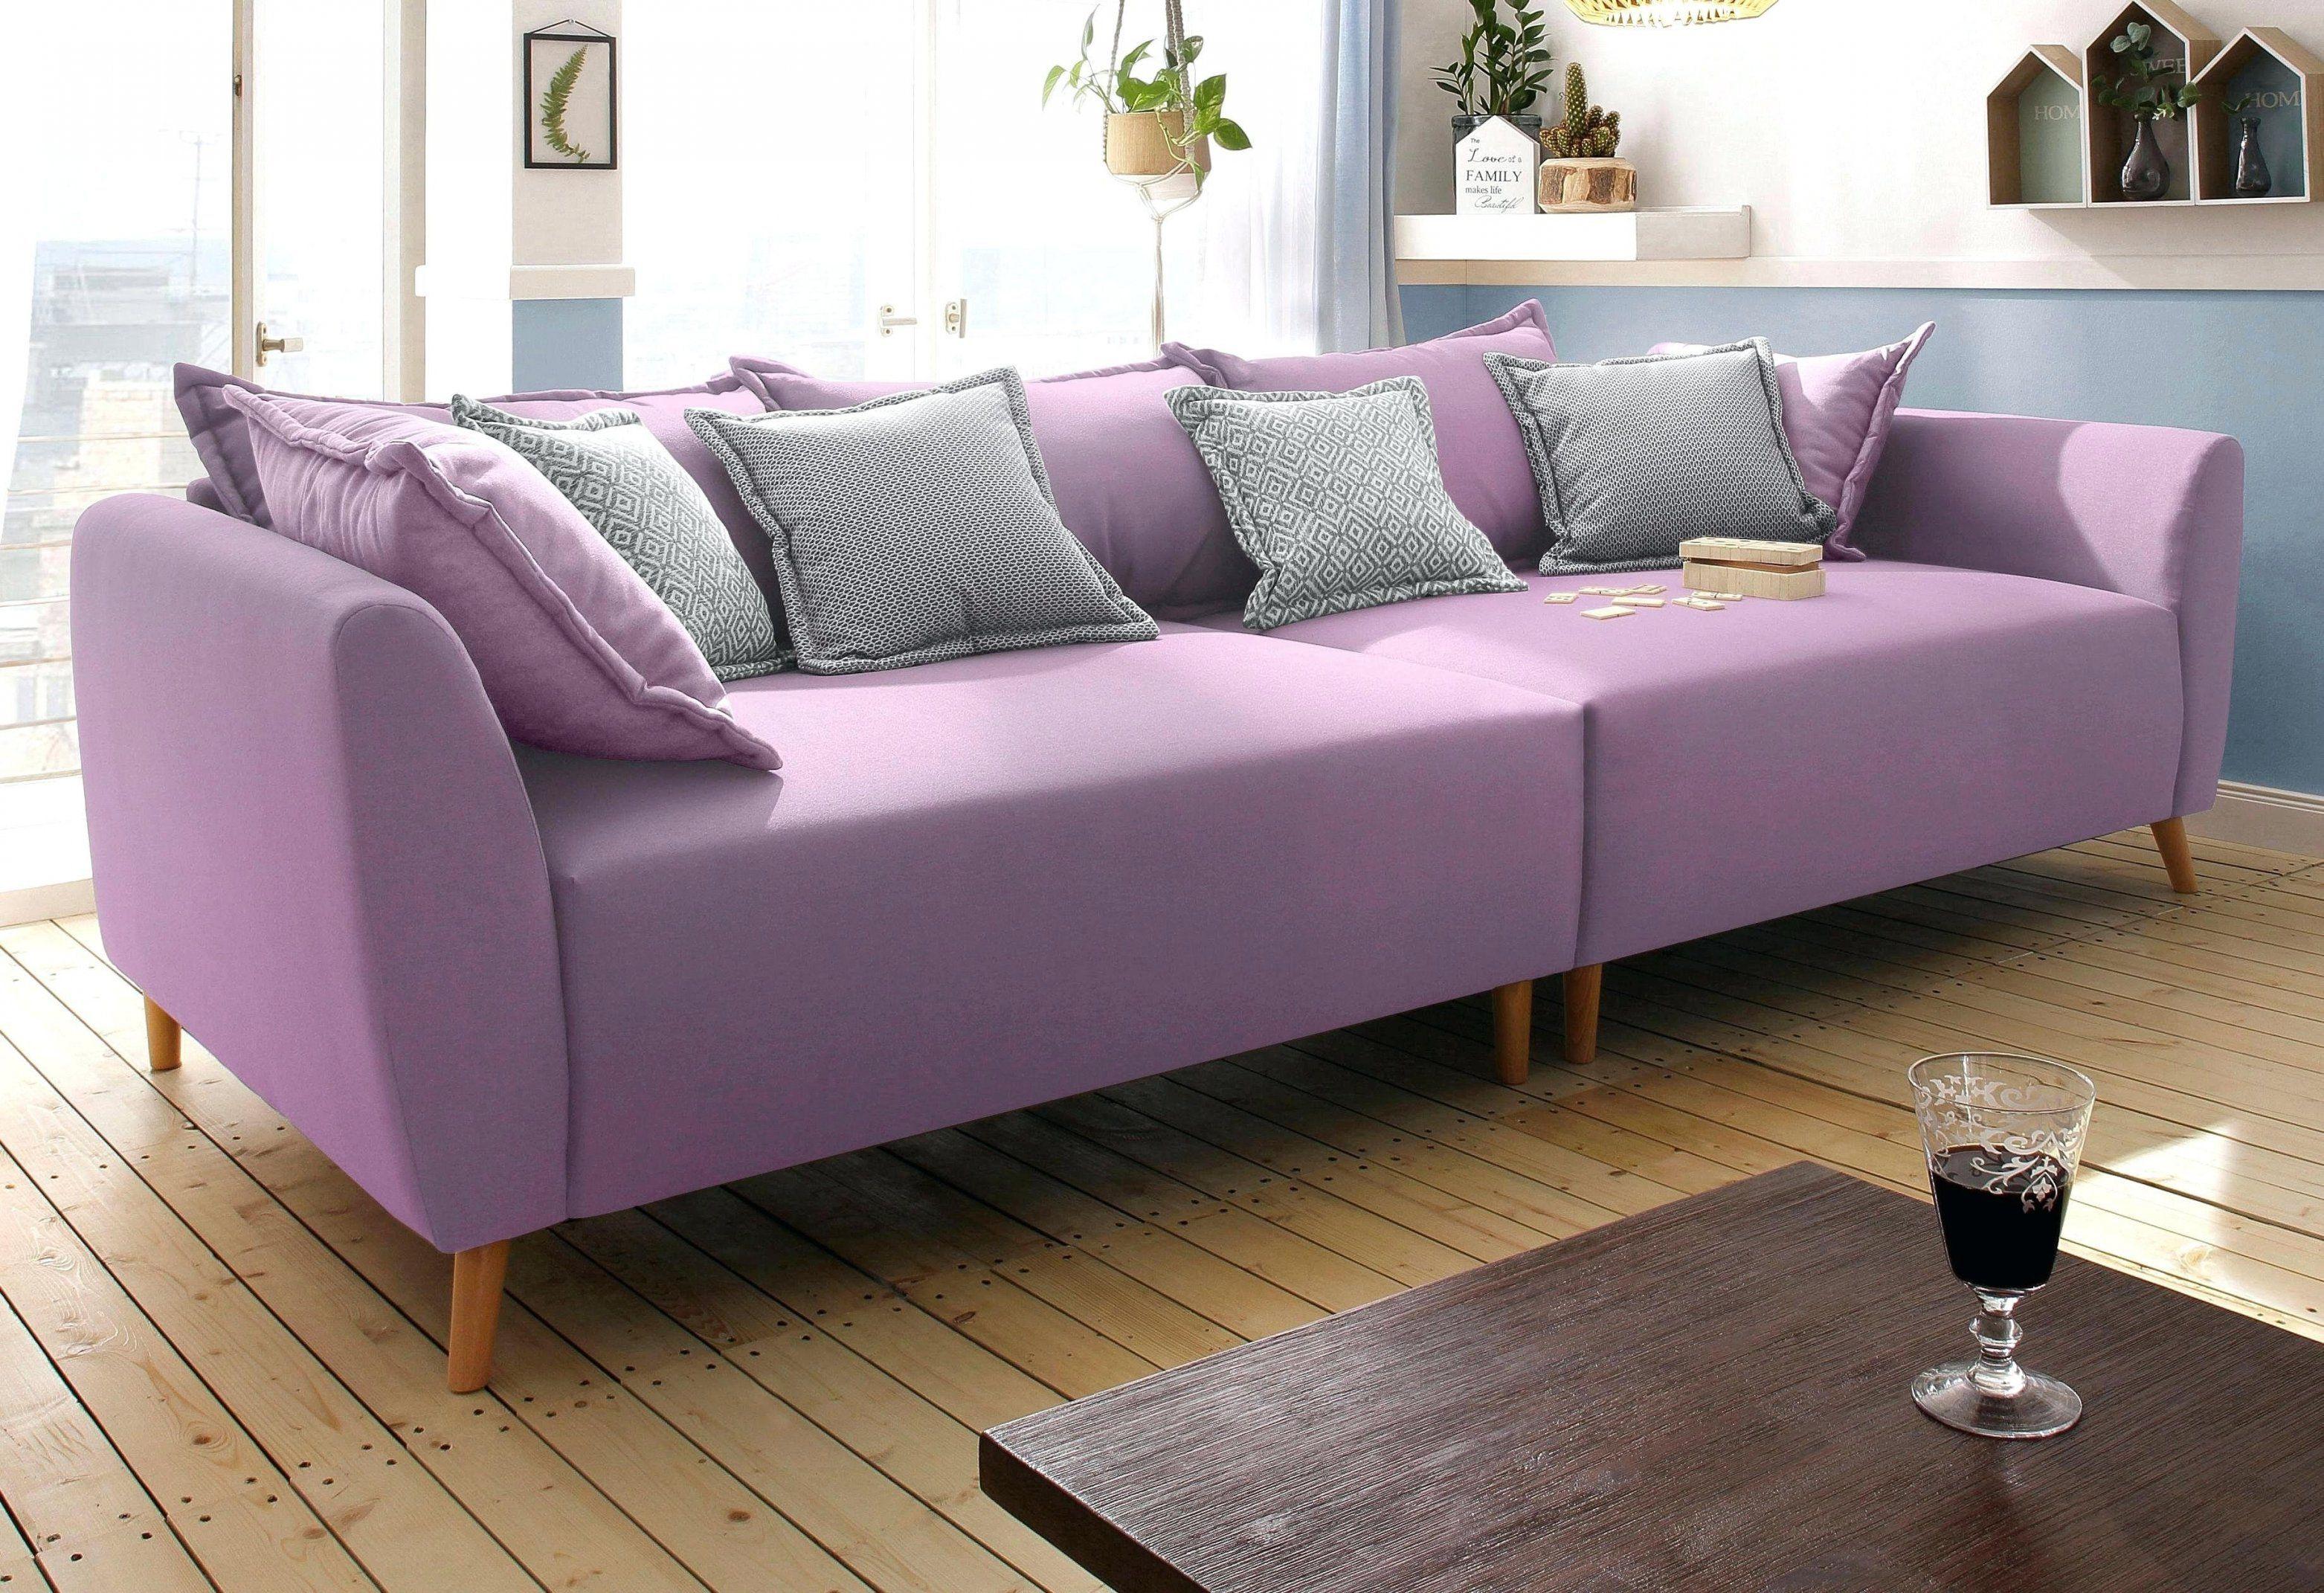 Otto Big Sofa Xxl Bild Grosse Sofas Sofa Design Xxl Sofa